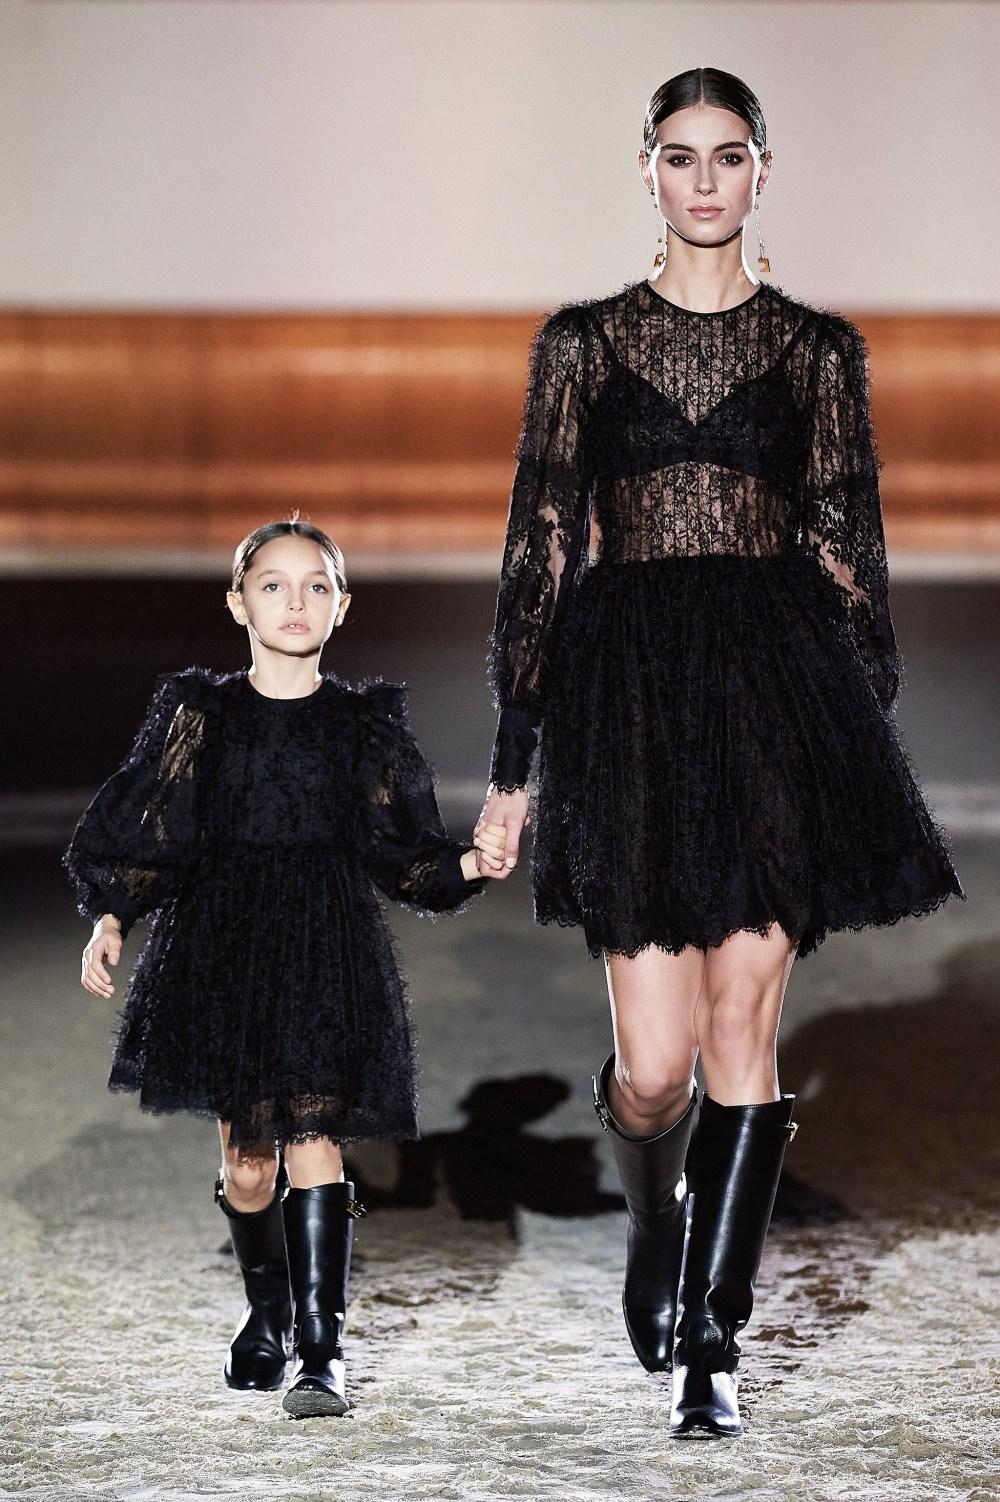 Elisabetta Franchi: Elisabetta Franchi Fall Winter 2021-22 Fashion Show Photo #29